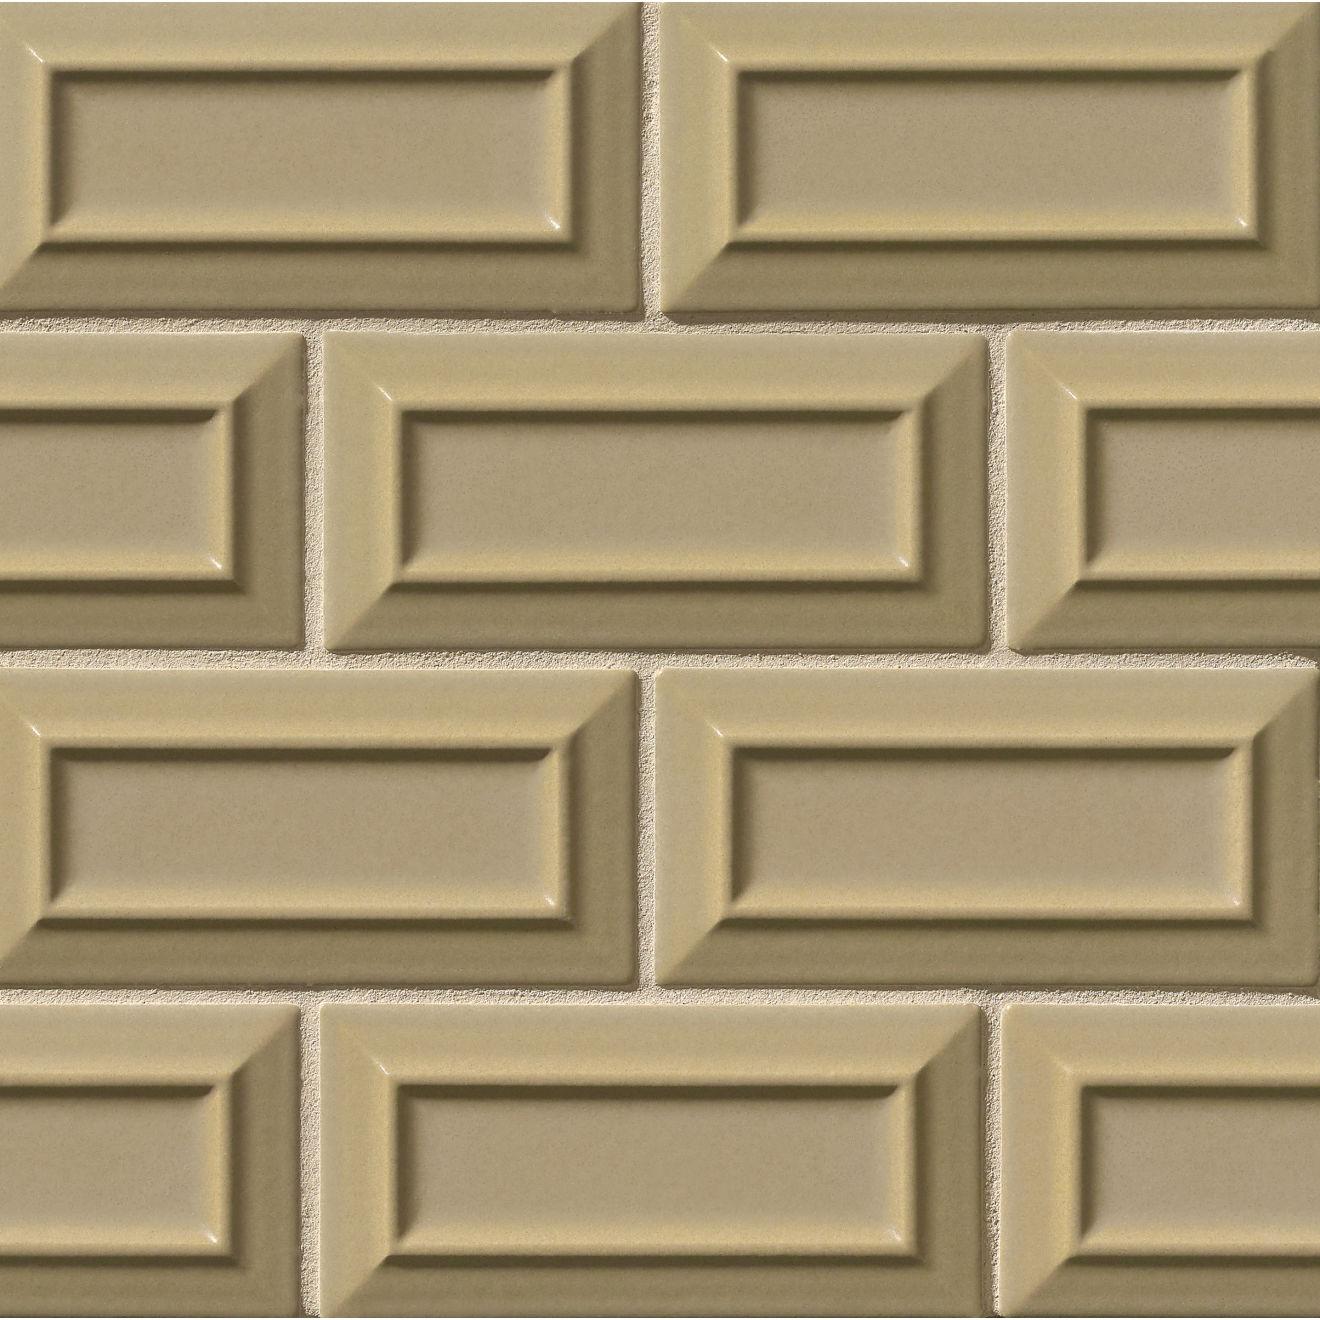 "Costa Allegra 3"" x 6"" Decorative Tile in Driftwood"